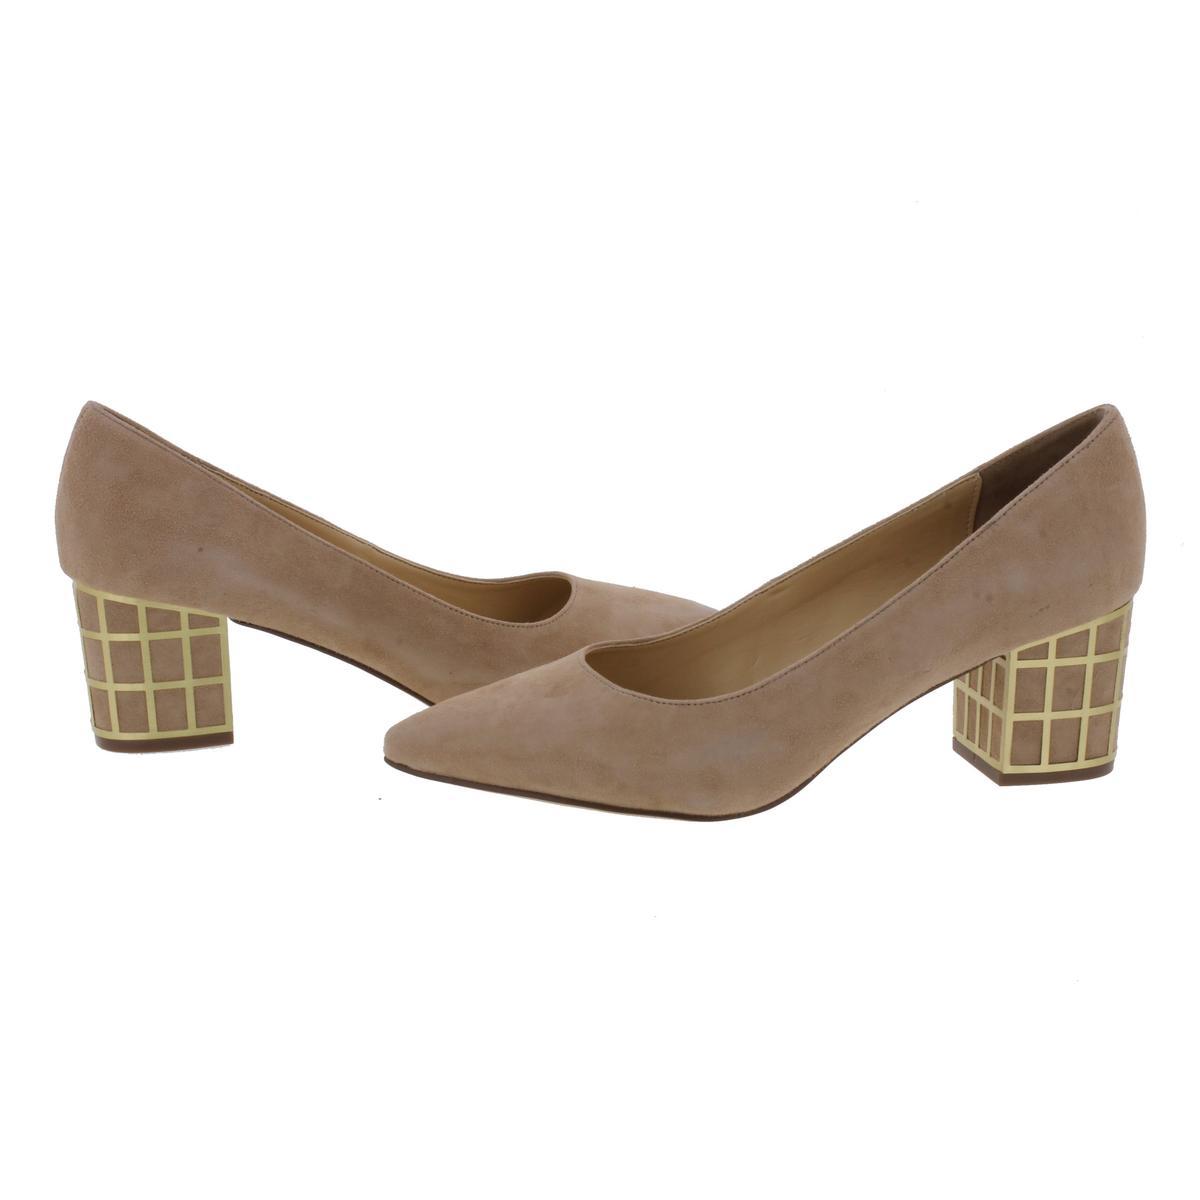 B Brian Atwood Damenschuhe Karina Embellished Pointed Toe Block Heels Schuhes BHFO 3092